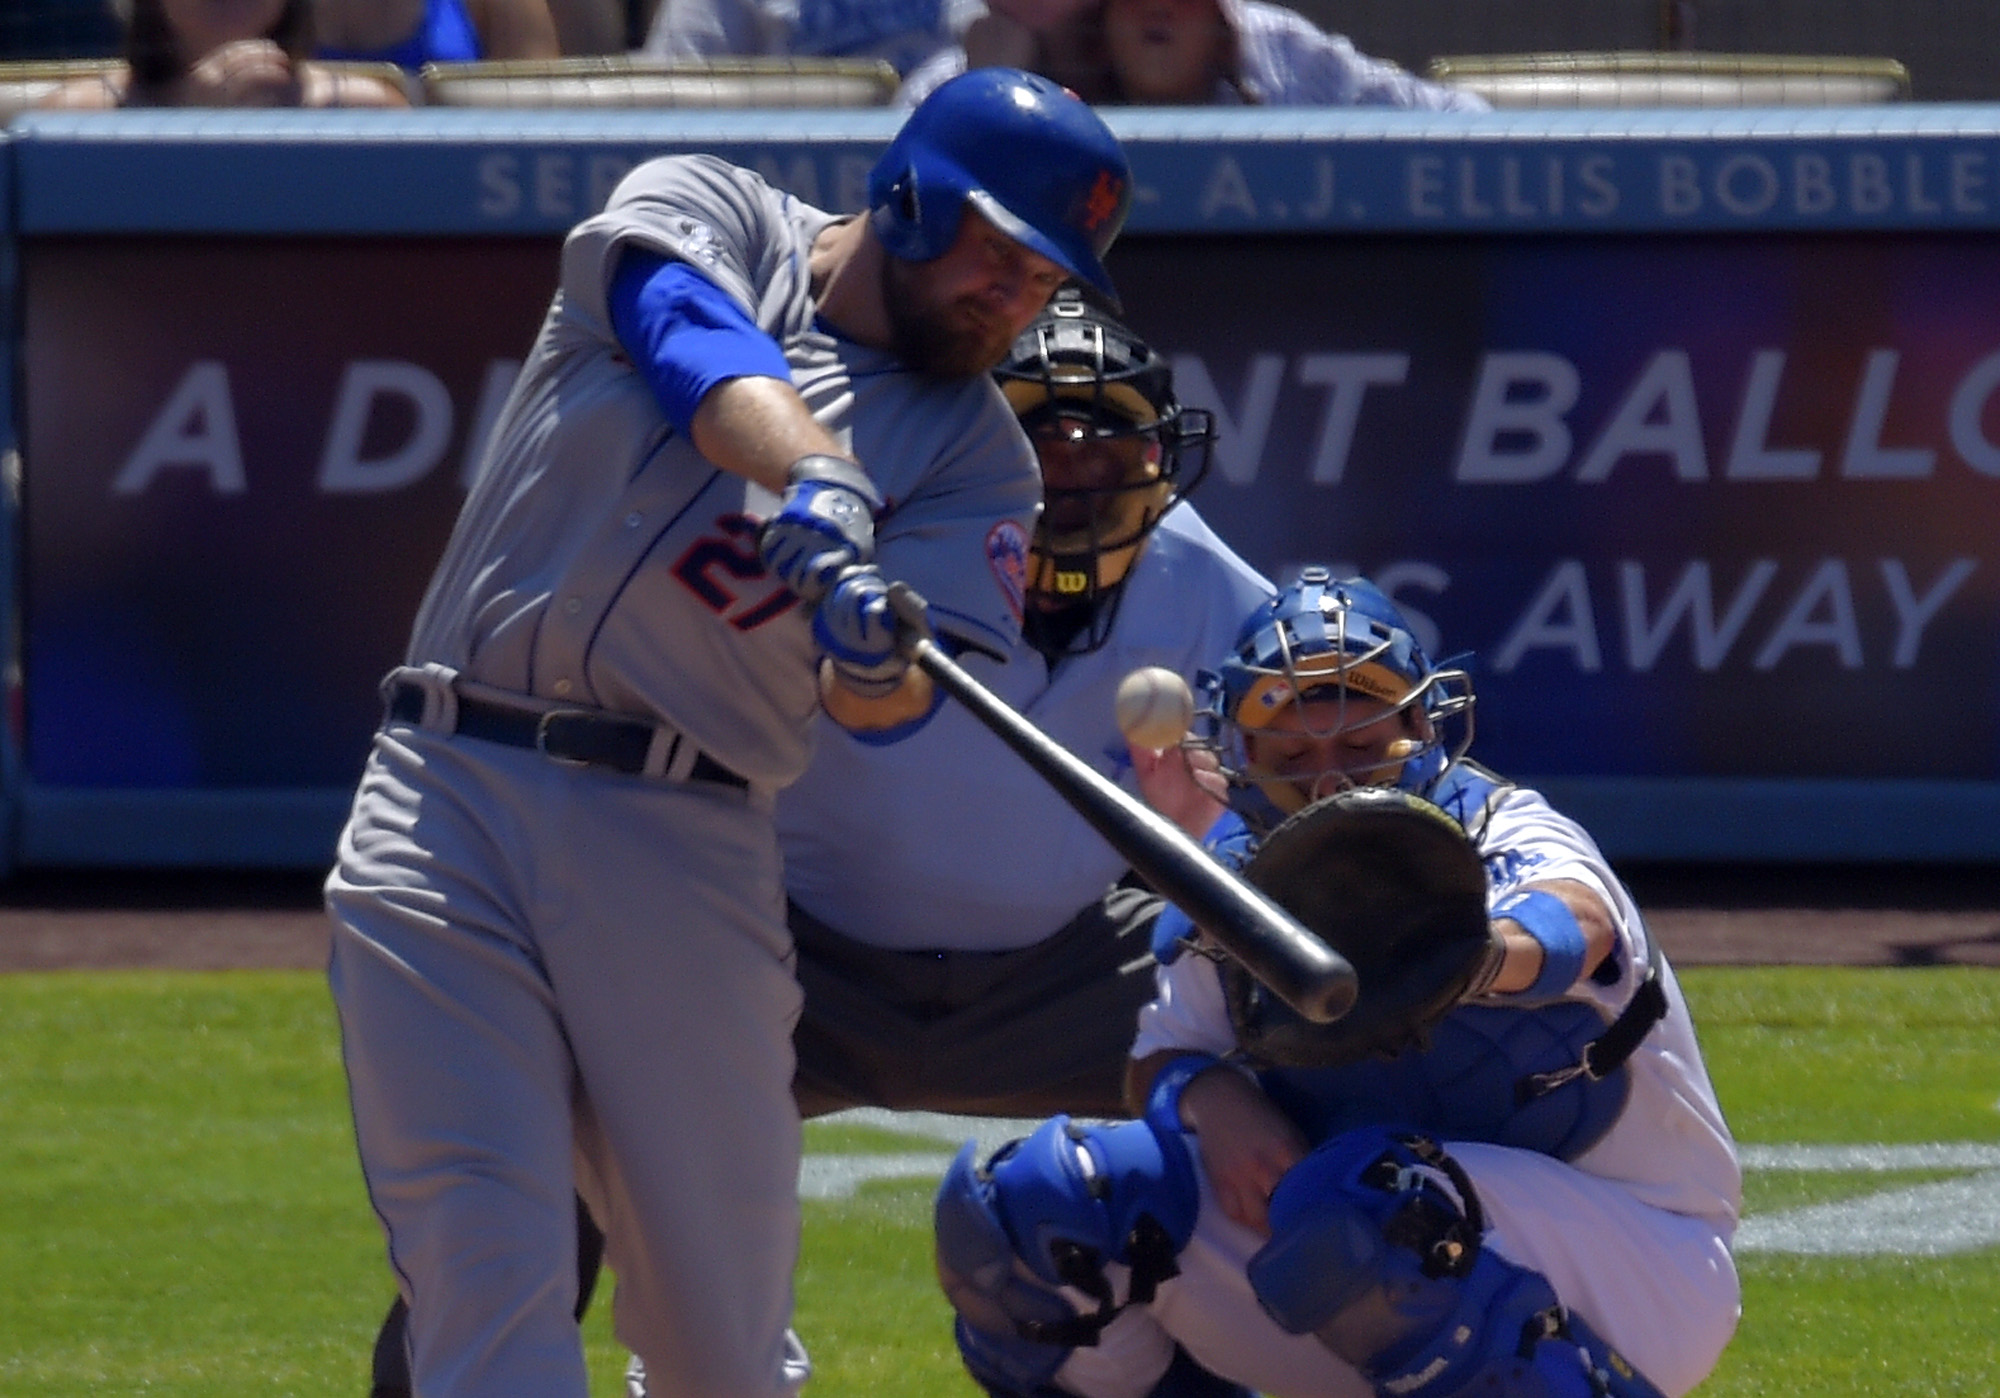 Mets turn triple play in 11-3 win over Dodgers